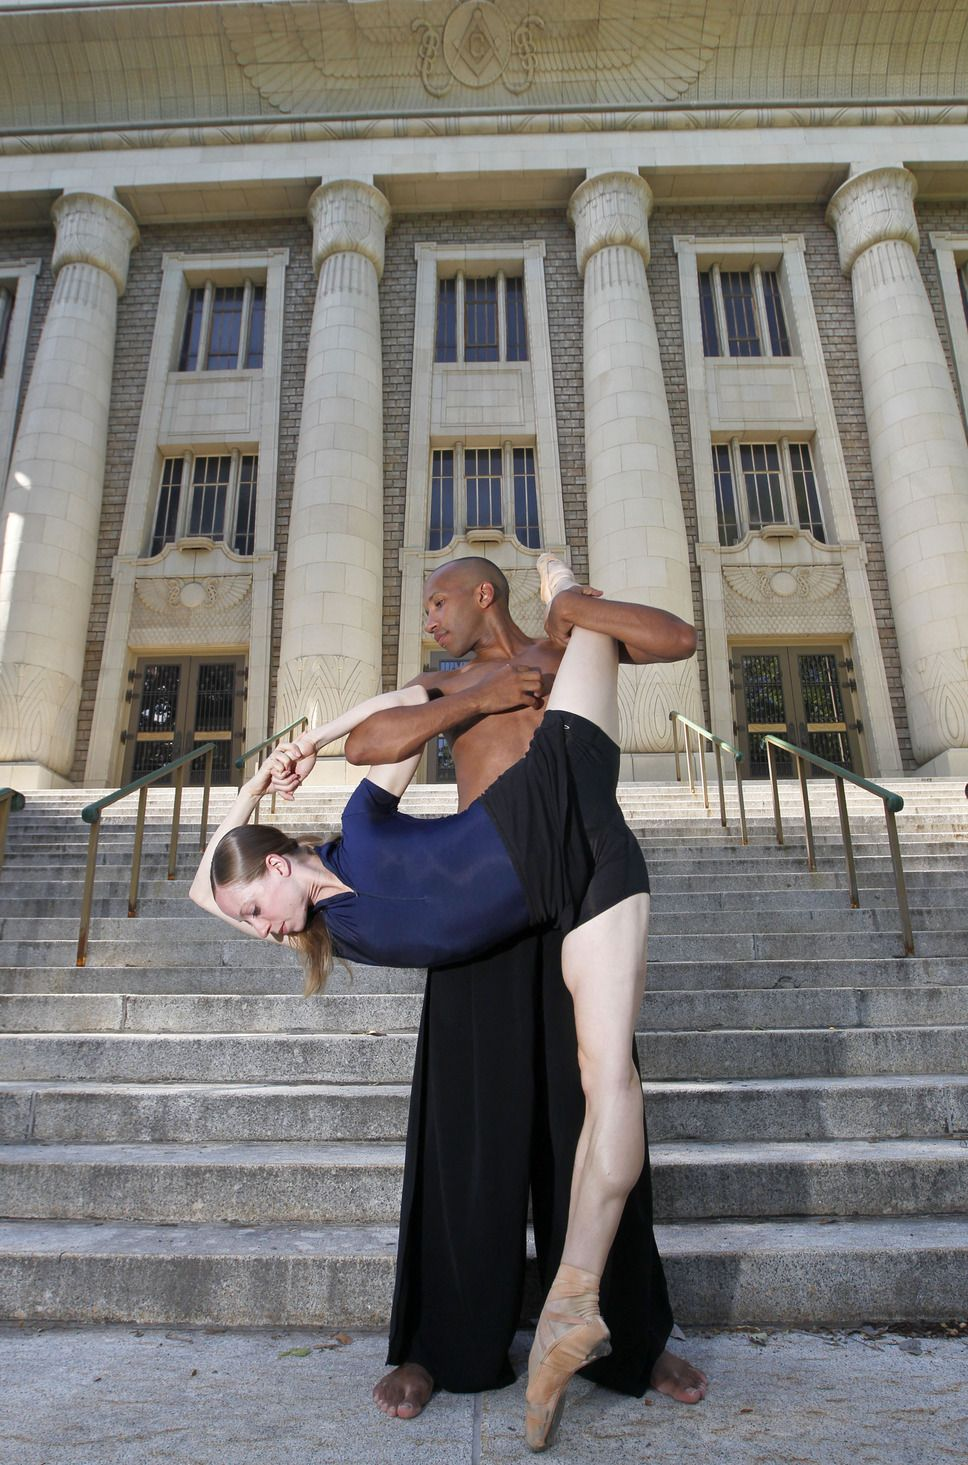 NOW International dancers Katherine Lawrence and Jo Blake